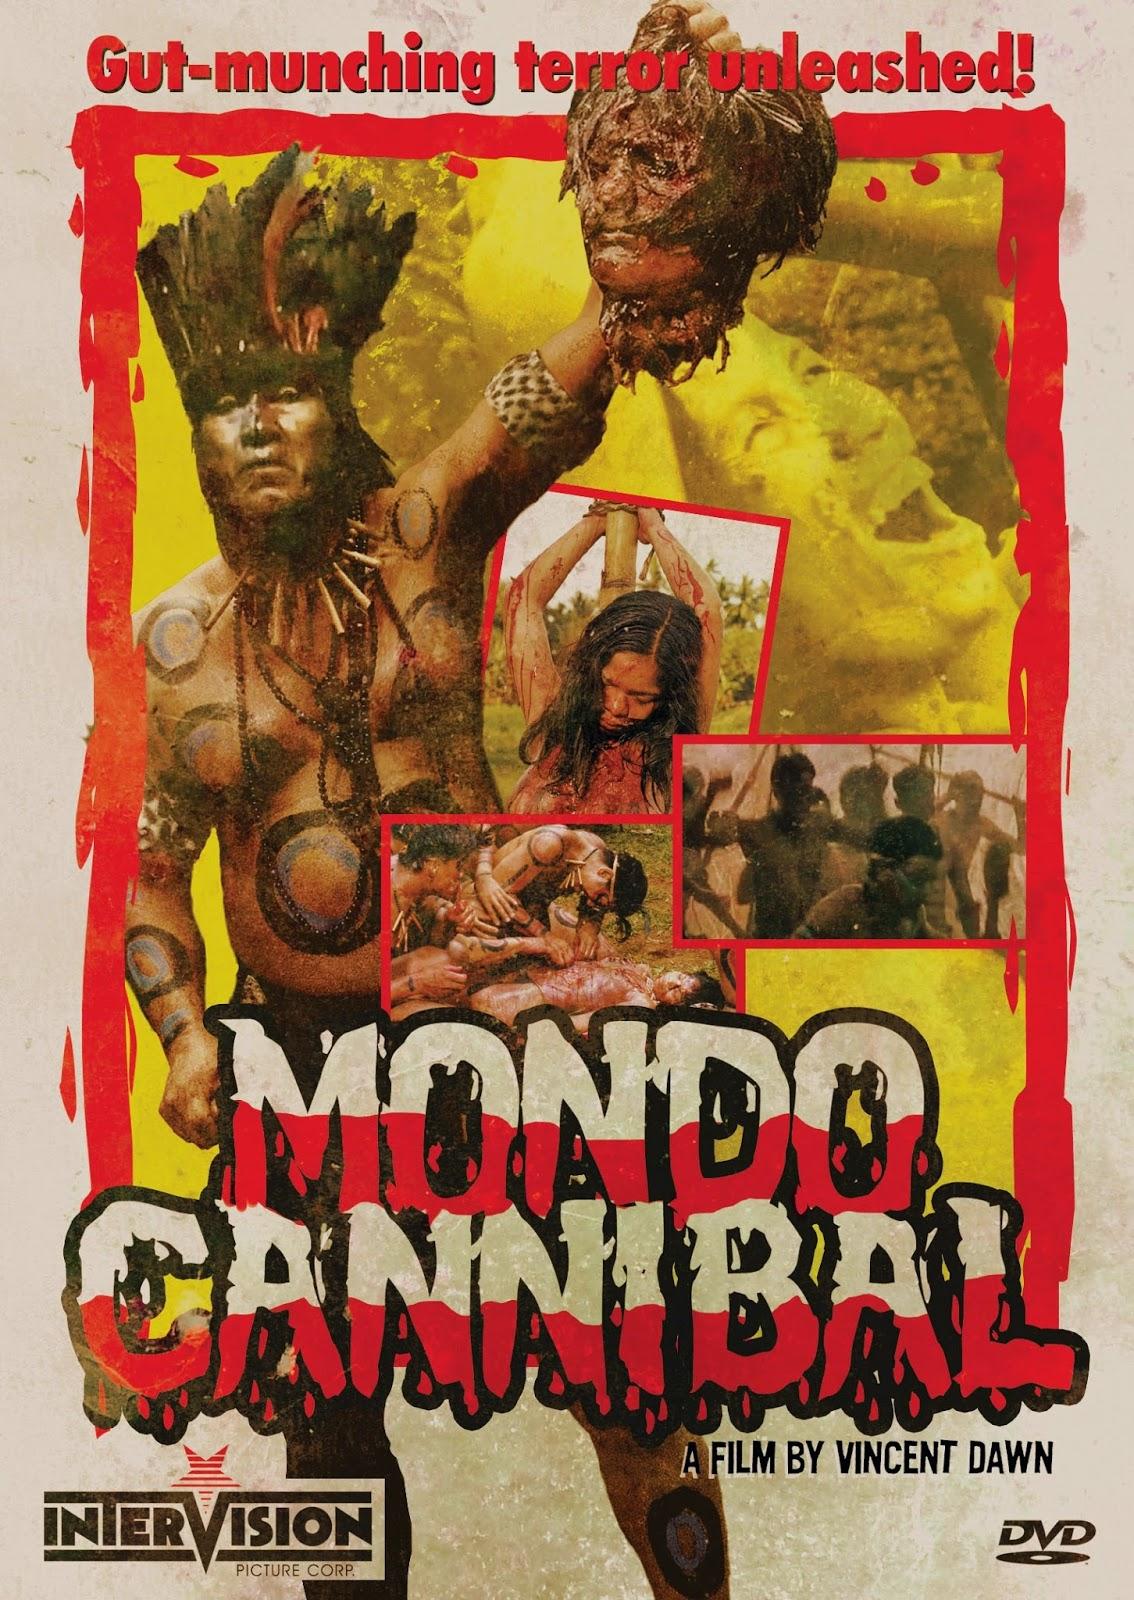 http://www.severin-films.com/2014/09/25/mondo-cannibal/